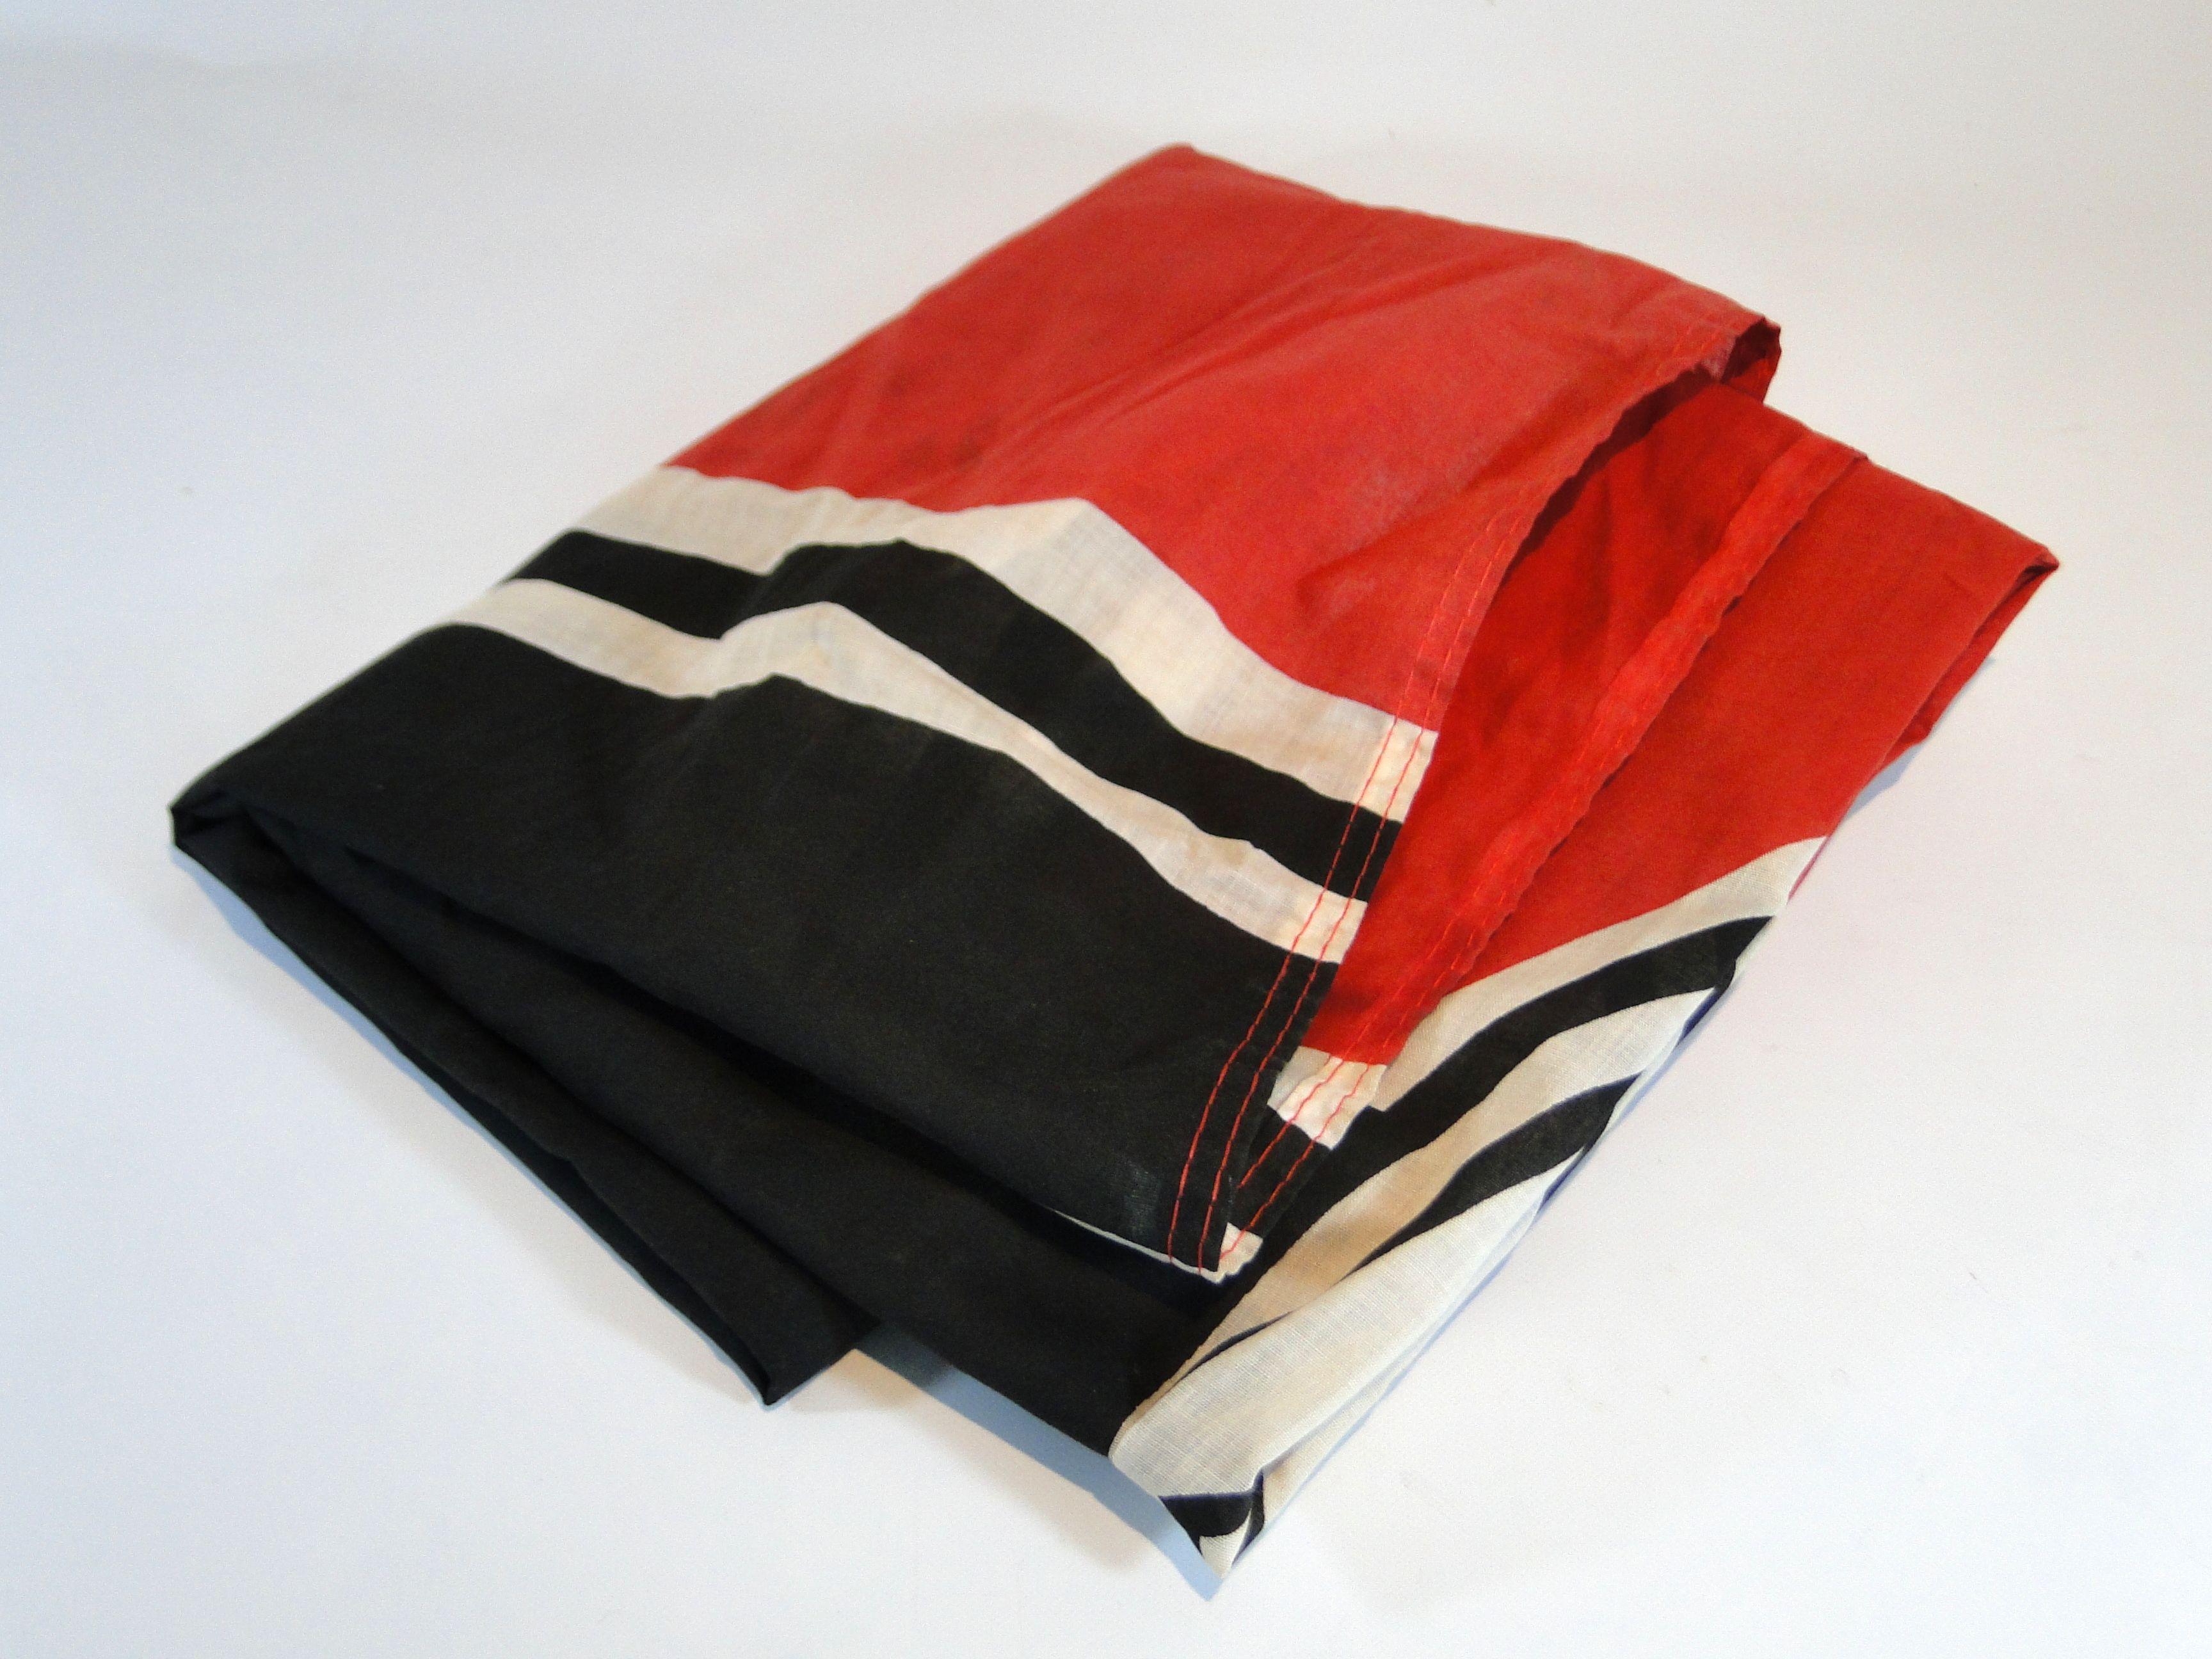 266) Large replica German flag Est. £15-£25